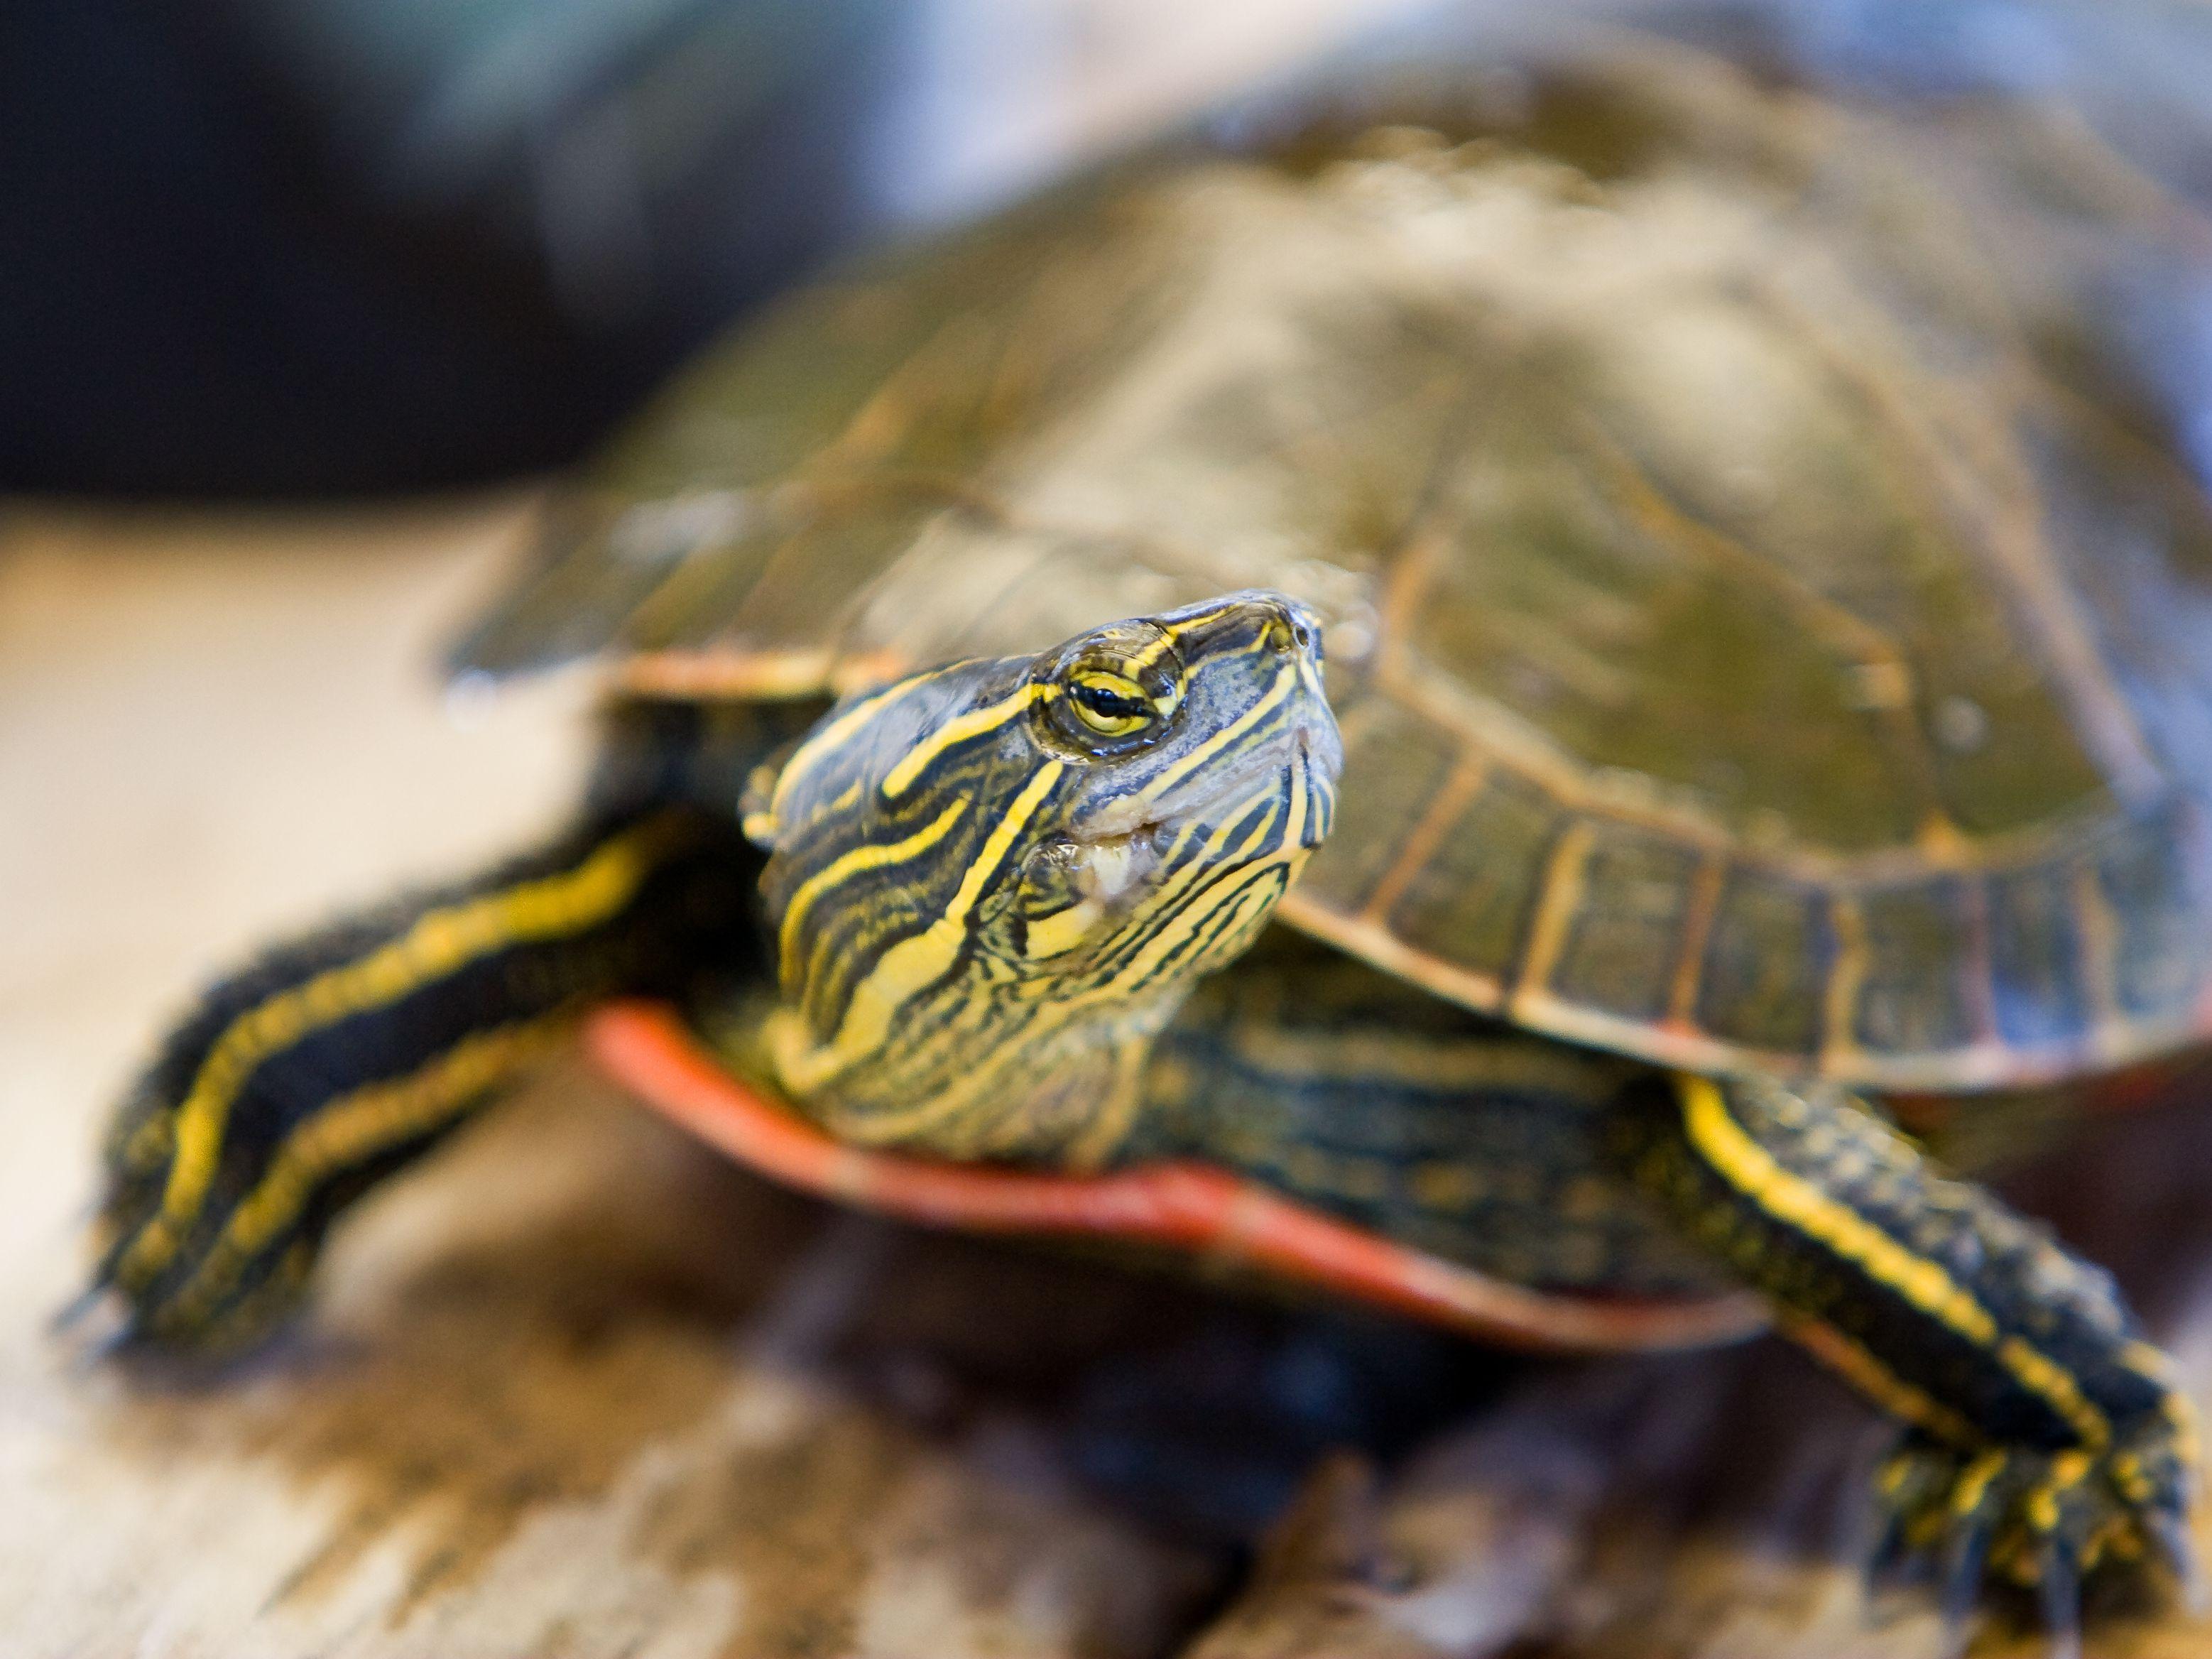 Should You Keep A Wild Turtle